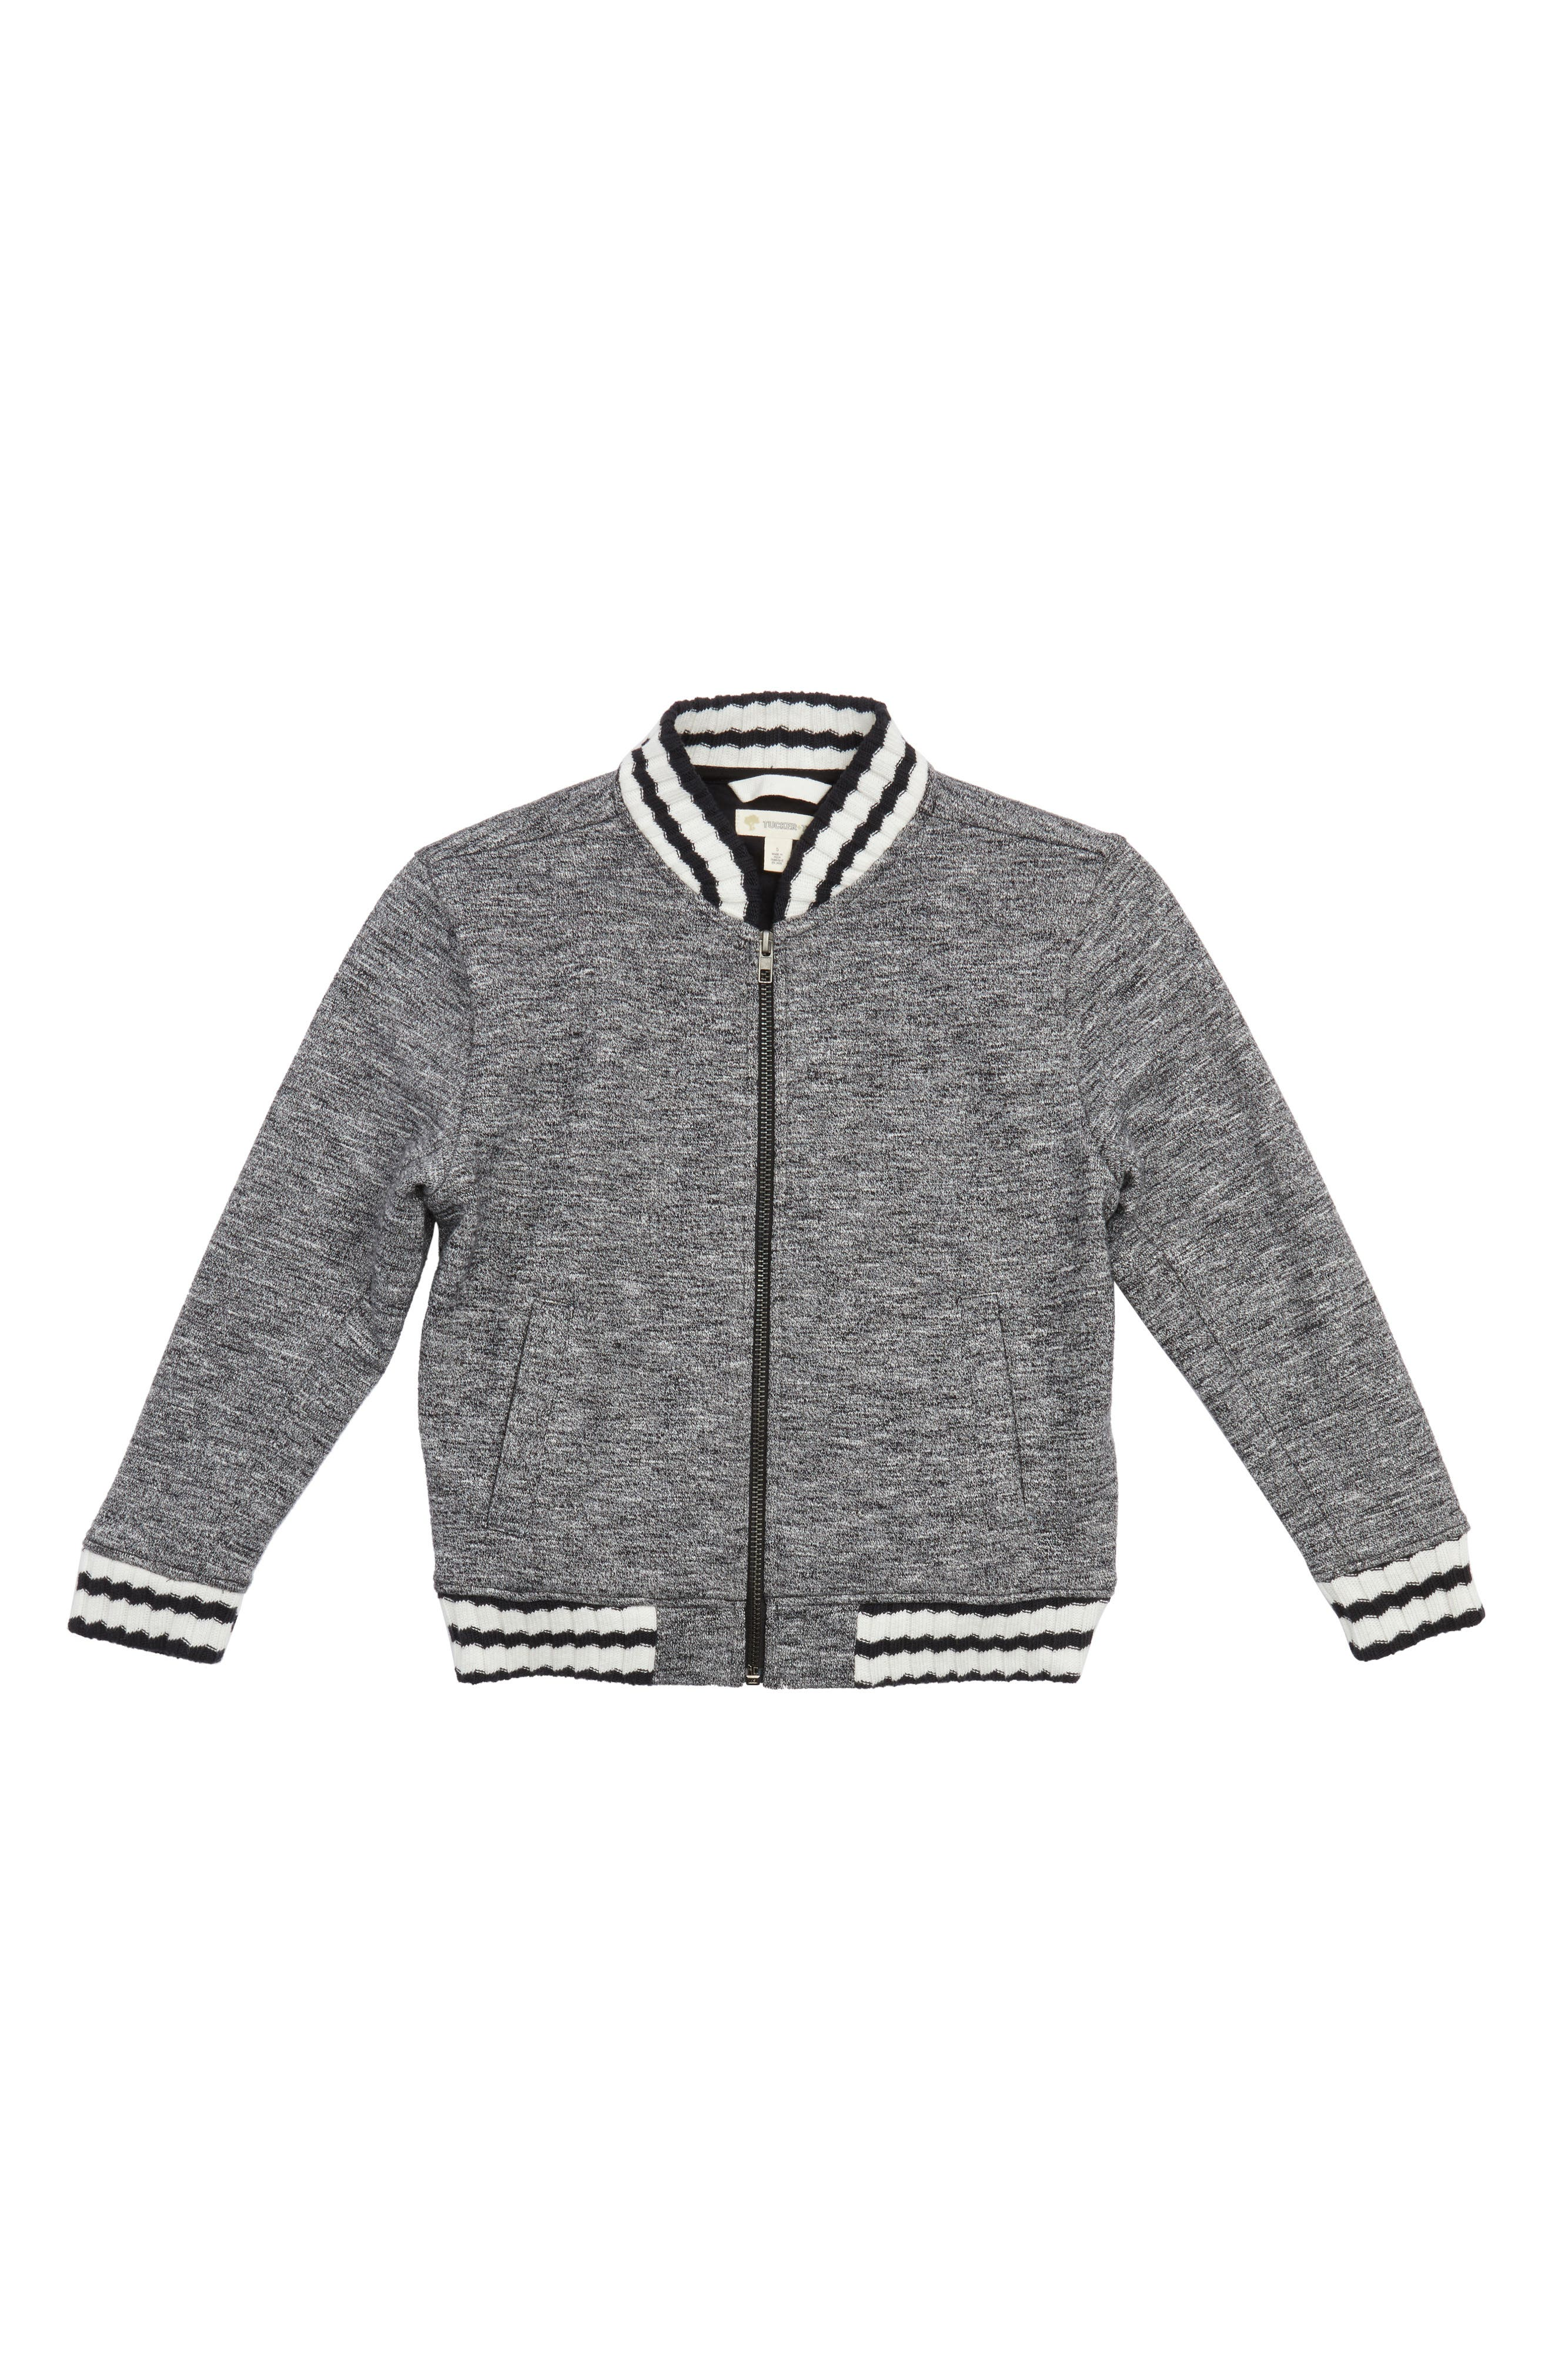 Mélange Varsity Jacket,                         Main,                         color, 001